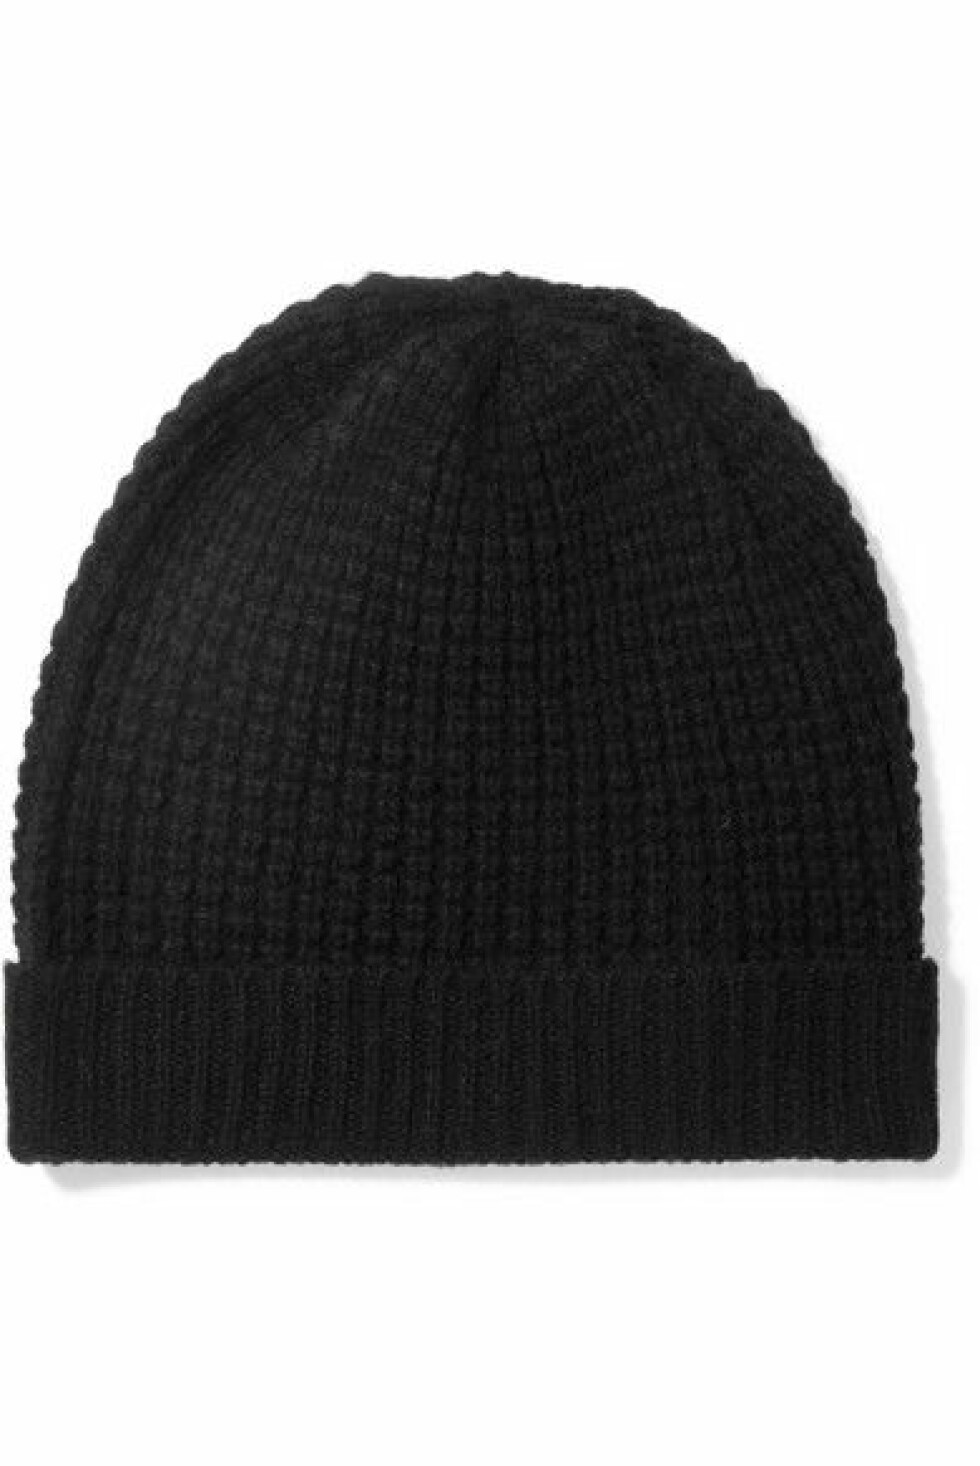 Kasjmirlue fra Madeleine Thompson |1444,-| https://www.net-a-porter.com/no/en/product/885588/madeleine_thompson/holby-waffle-knit-cashmere-beanie